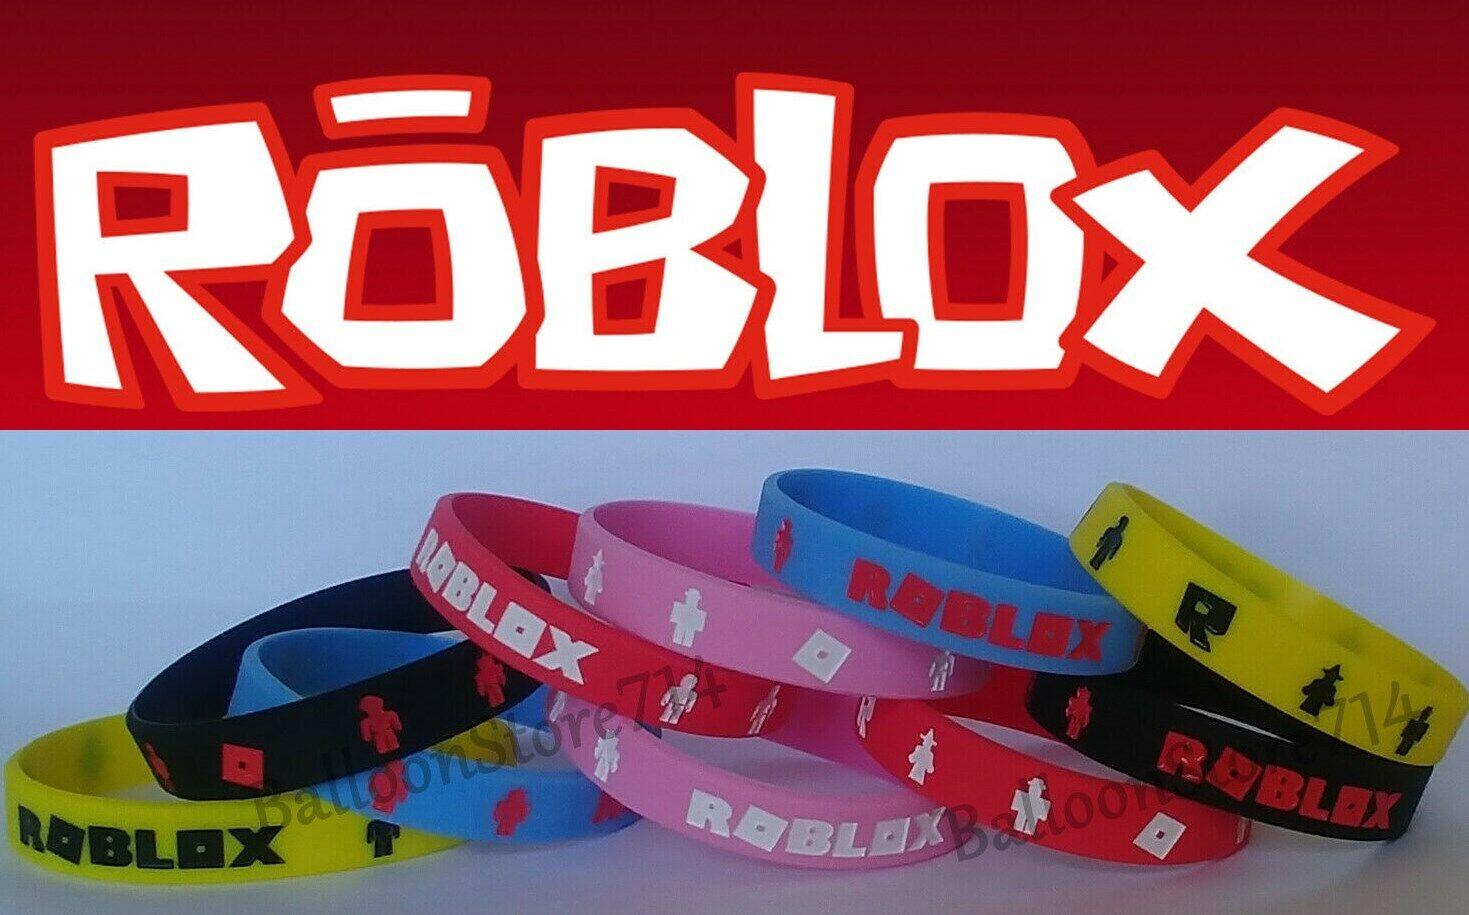 10 Piece ROBLOX Bracelet Set ~ ROBLOX Wristbands Birthday Pa